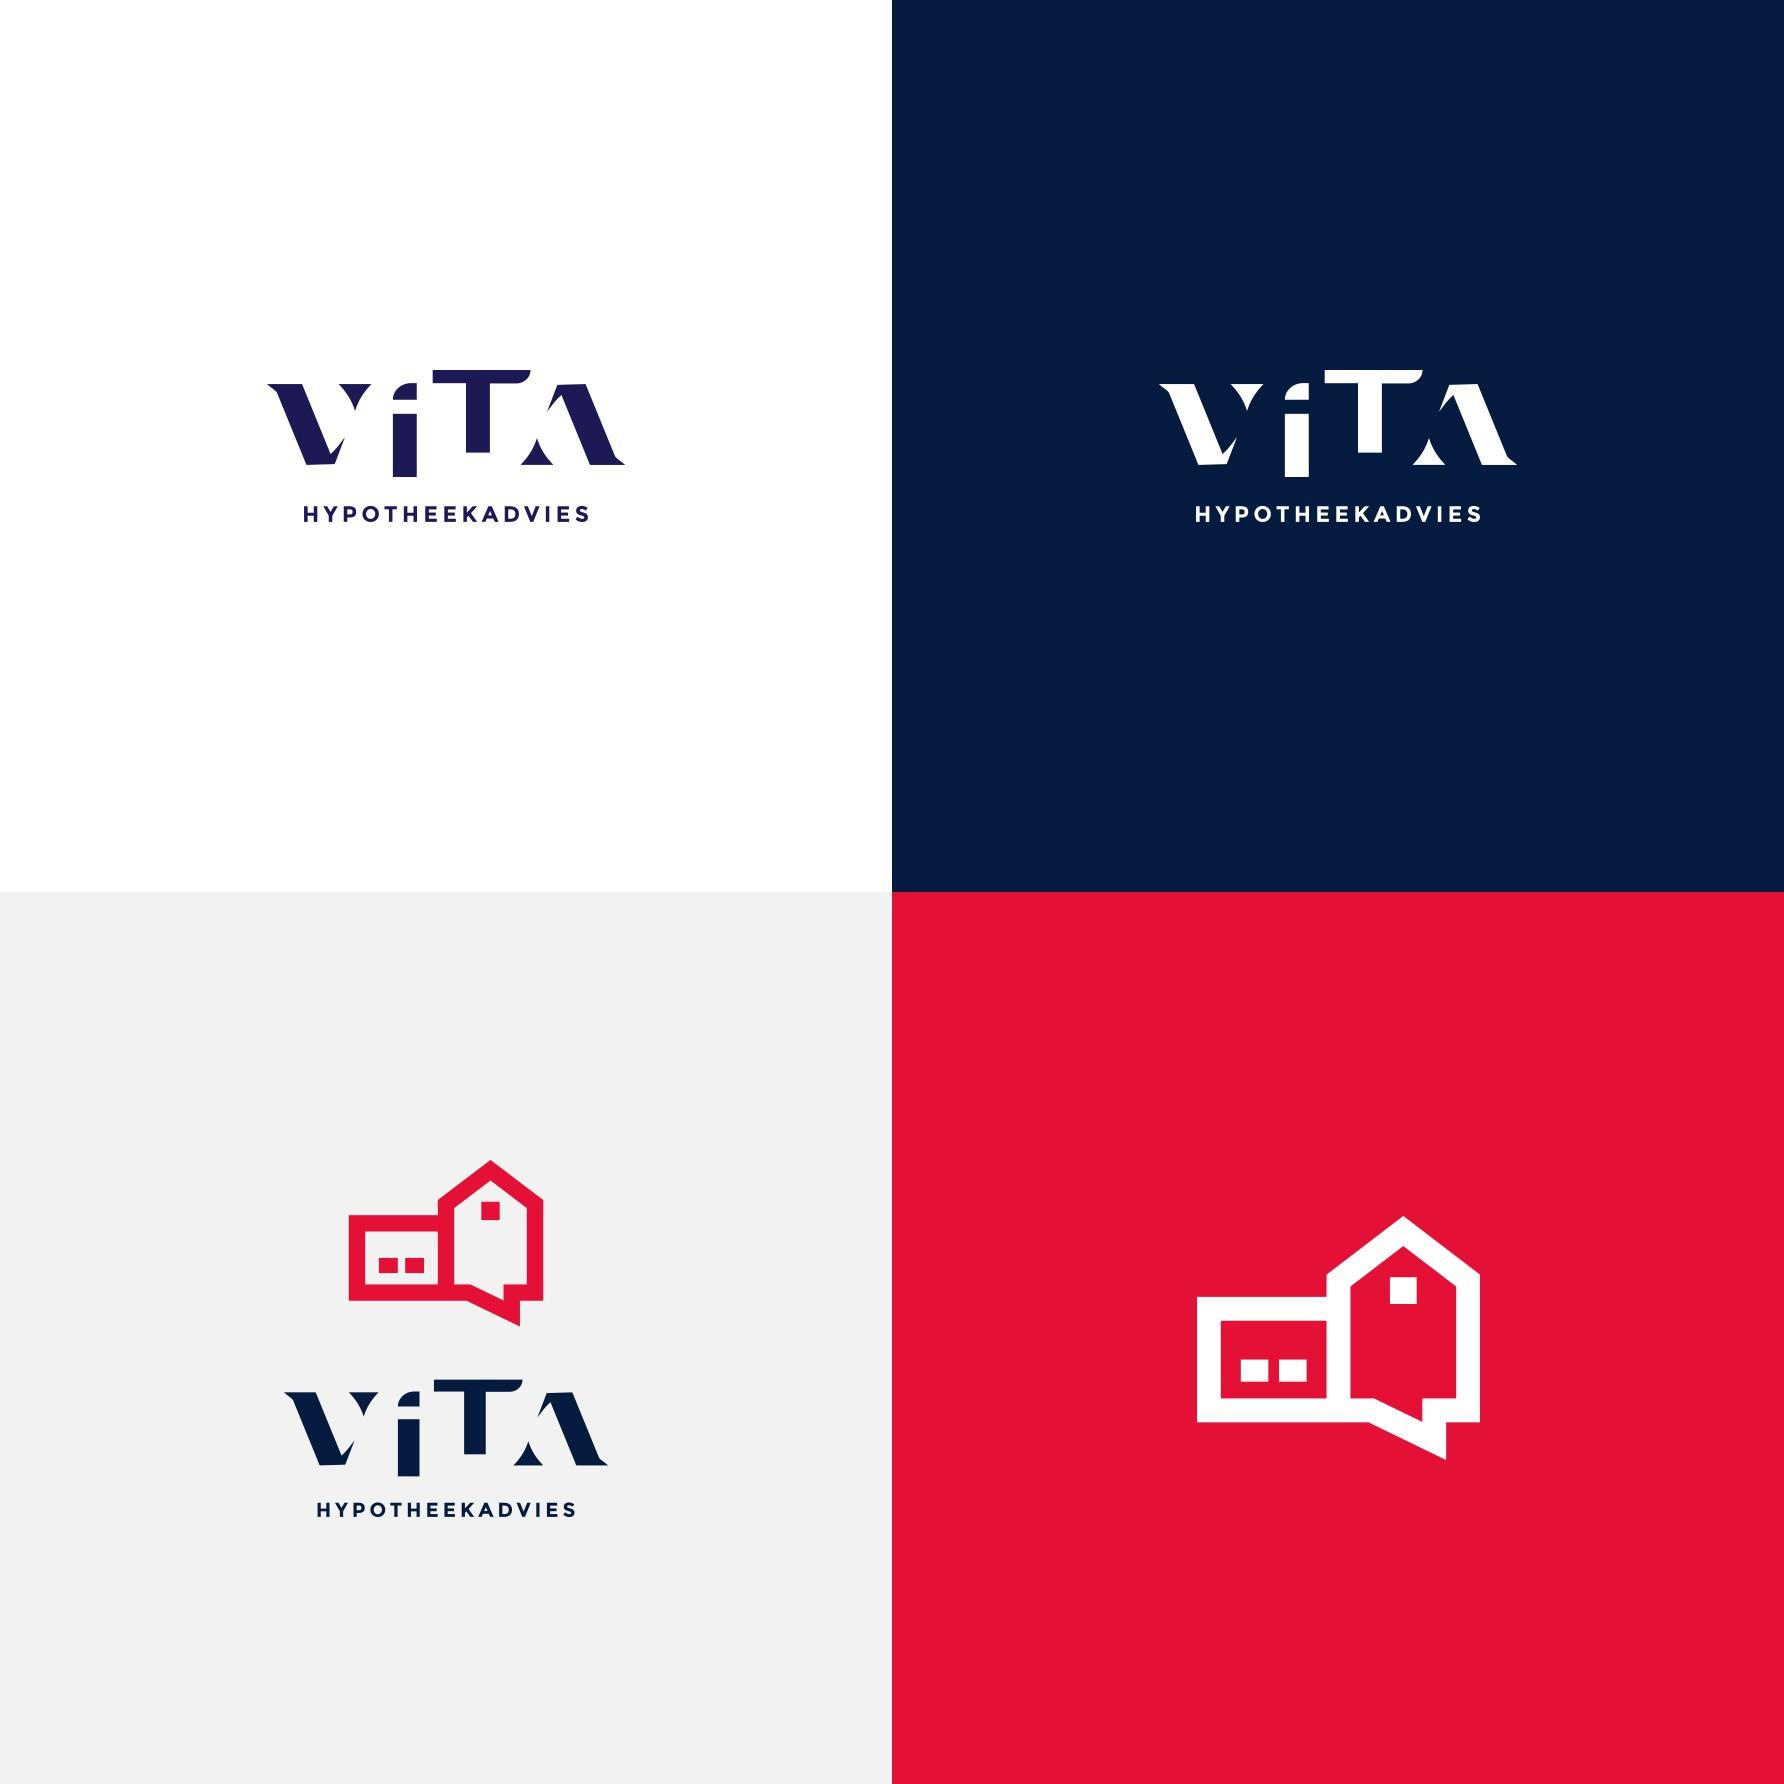 Vita Hypotheekadvies wil alsnog jouw design!